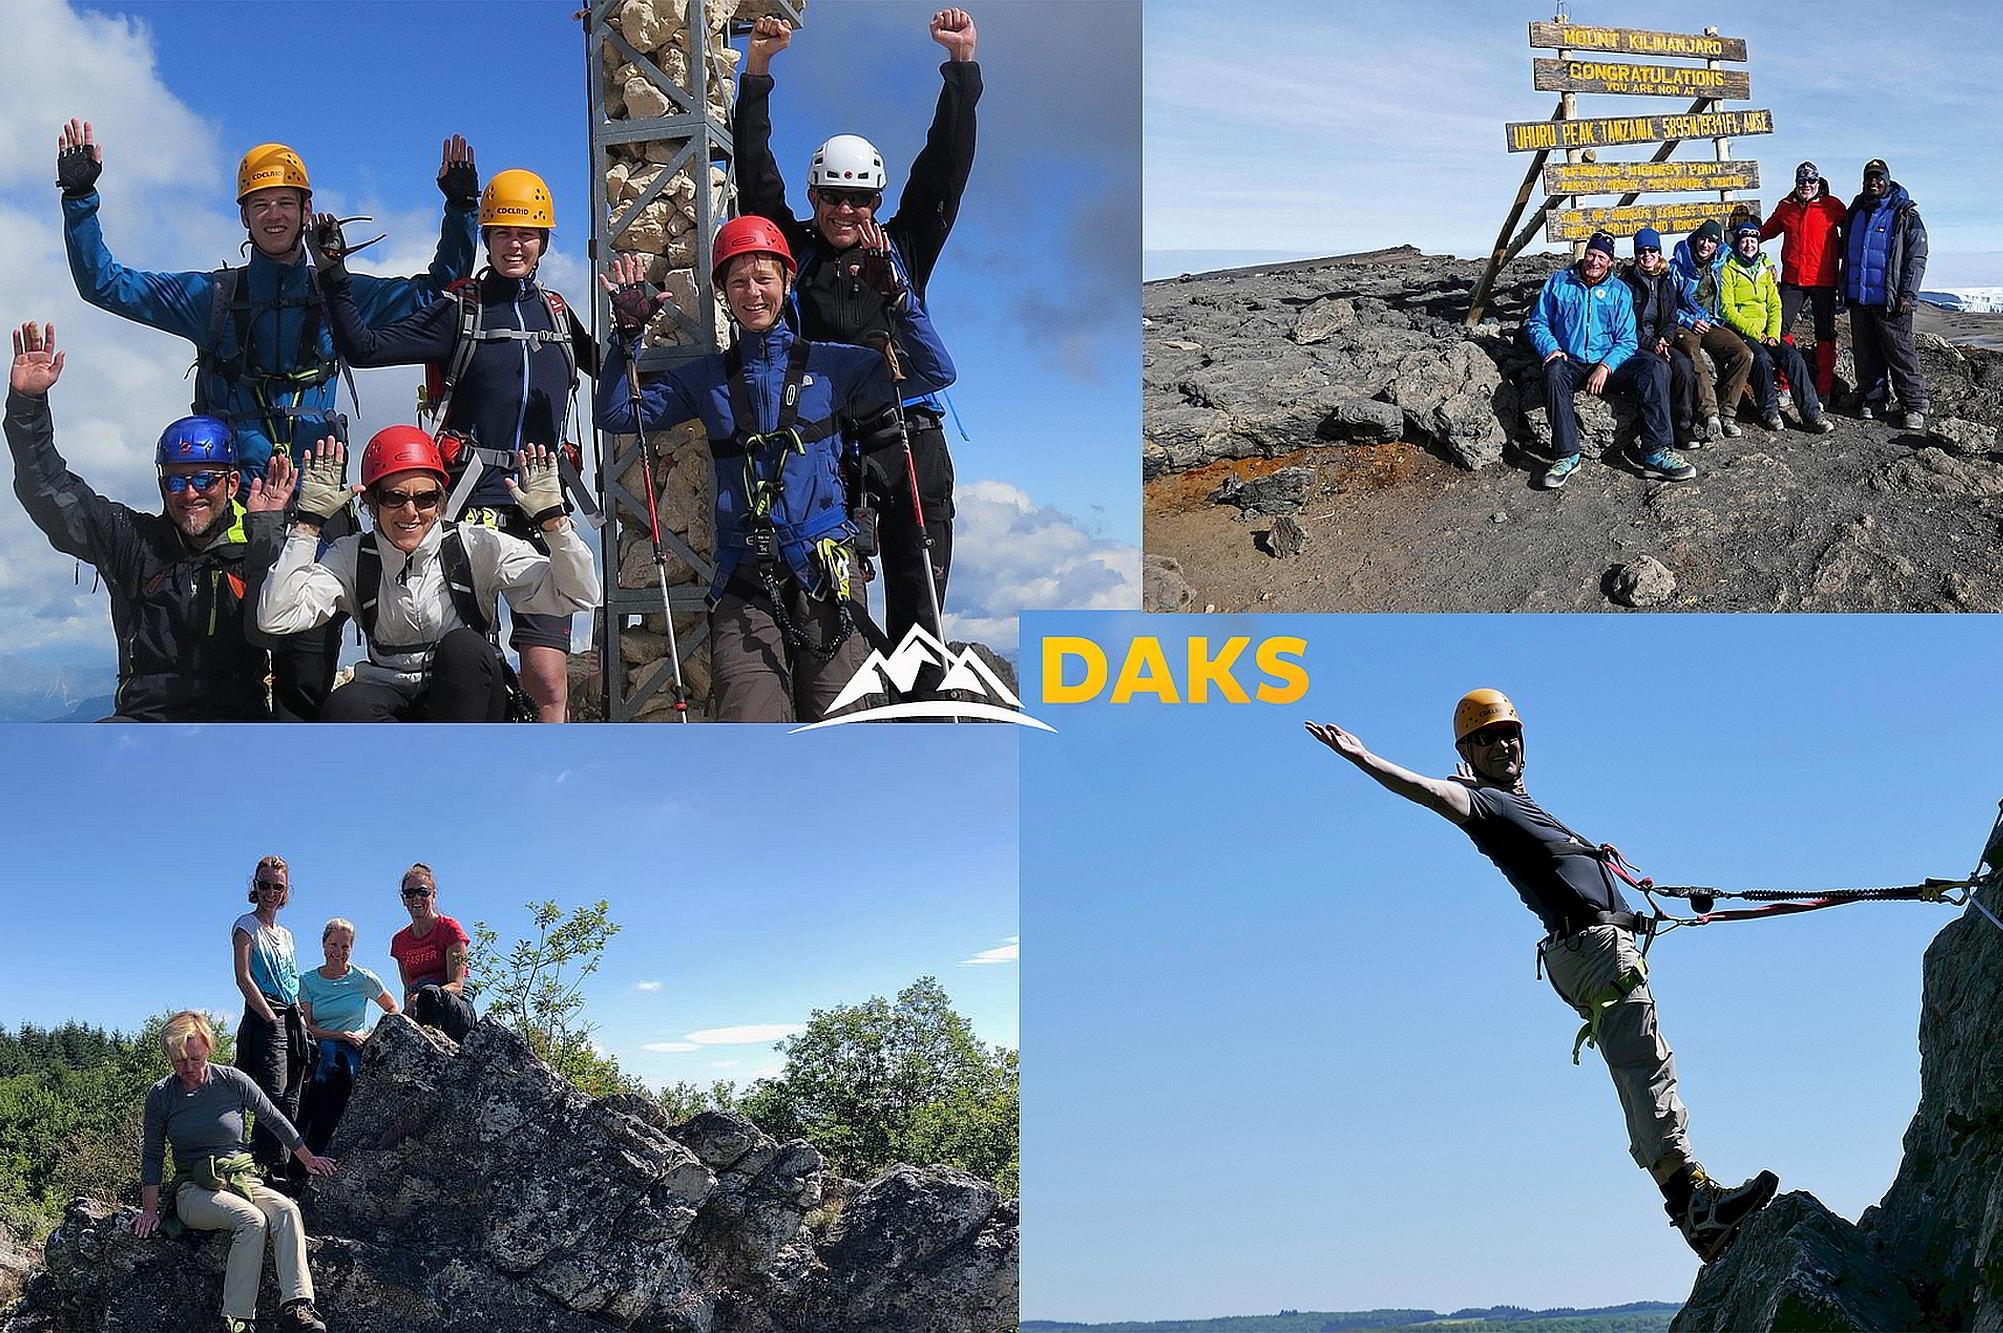 DAKS Bergreisen - Kunden Feedback